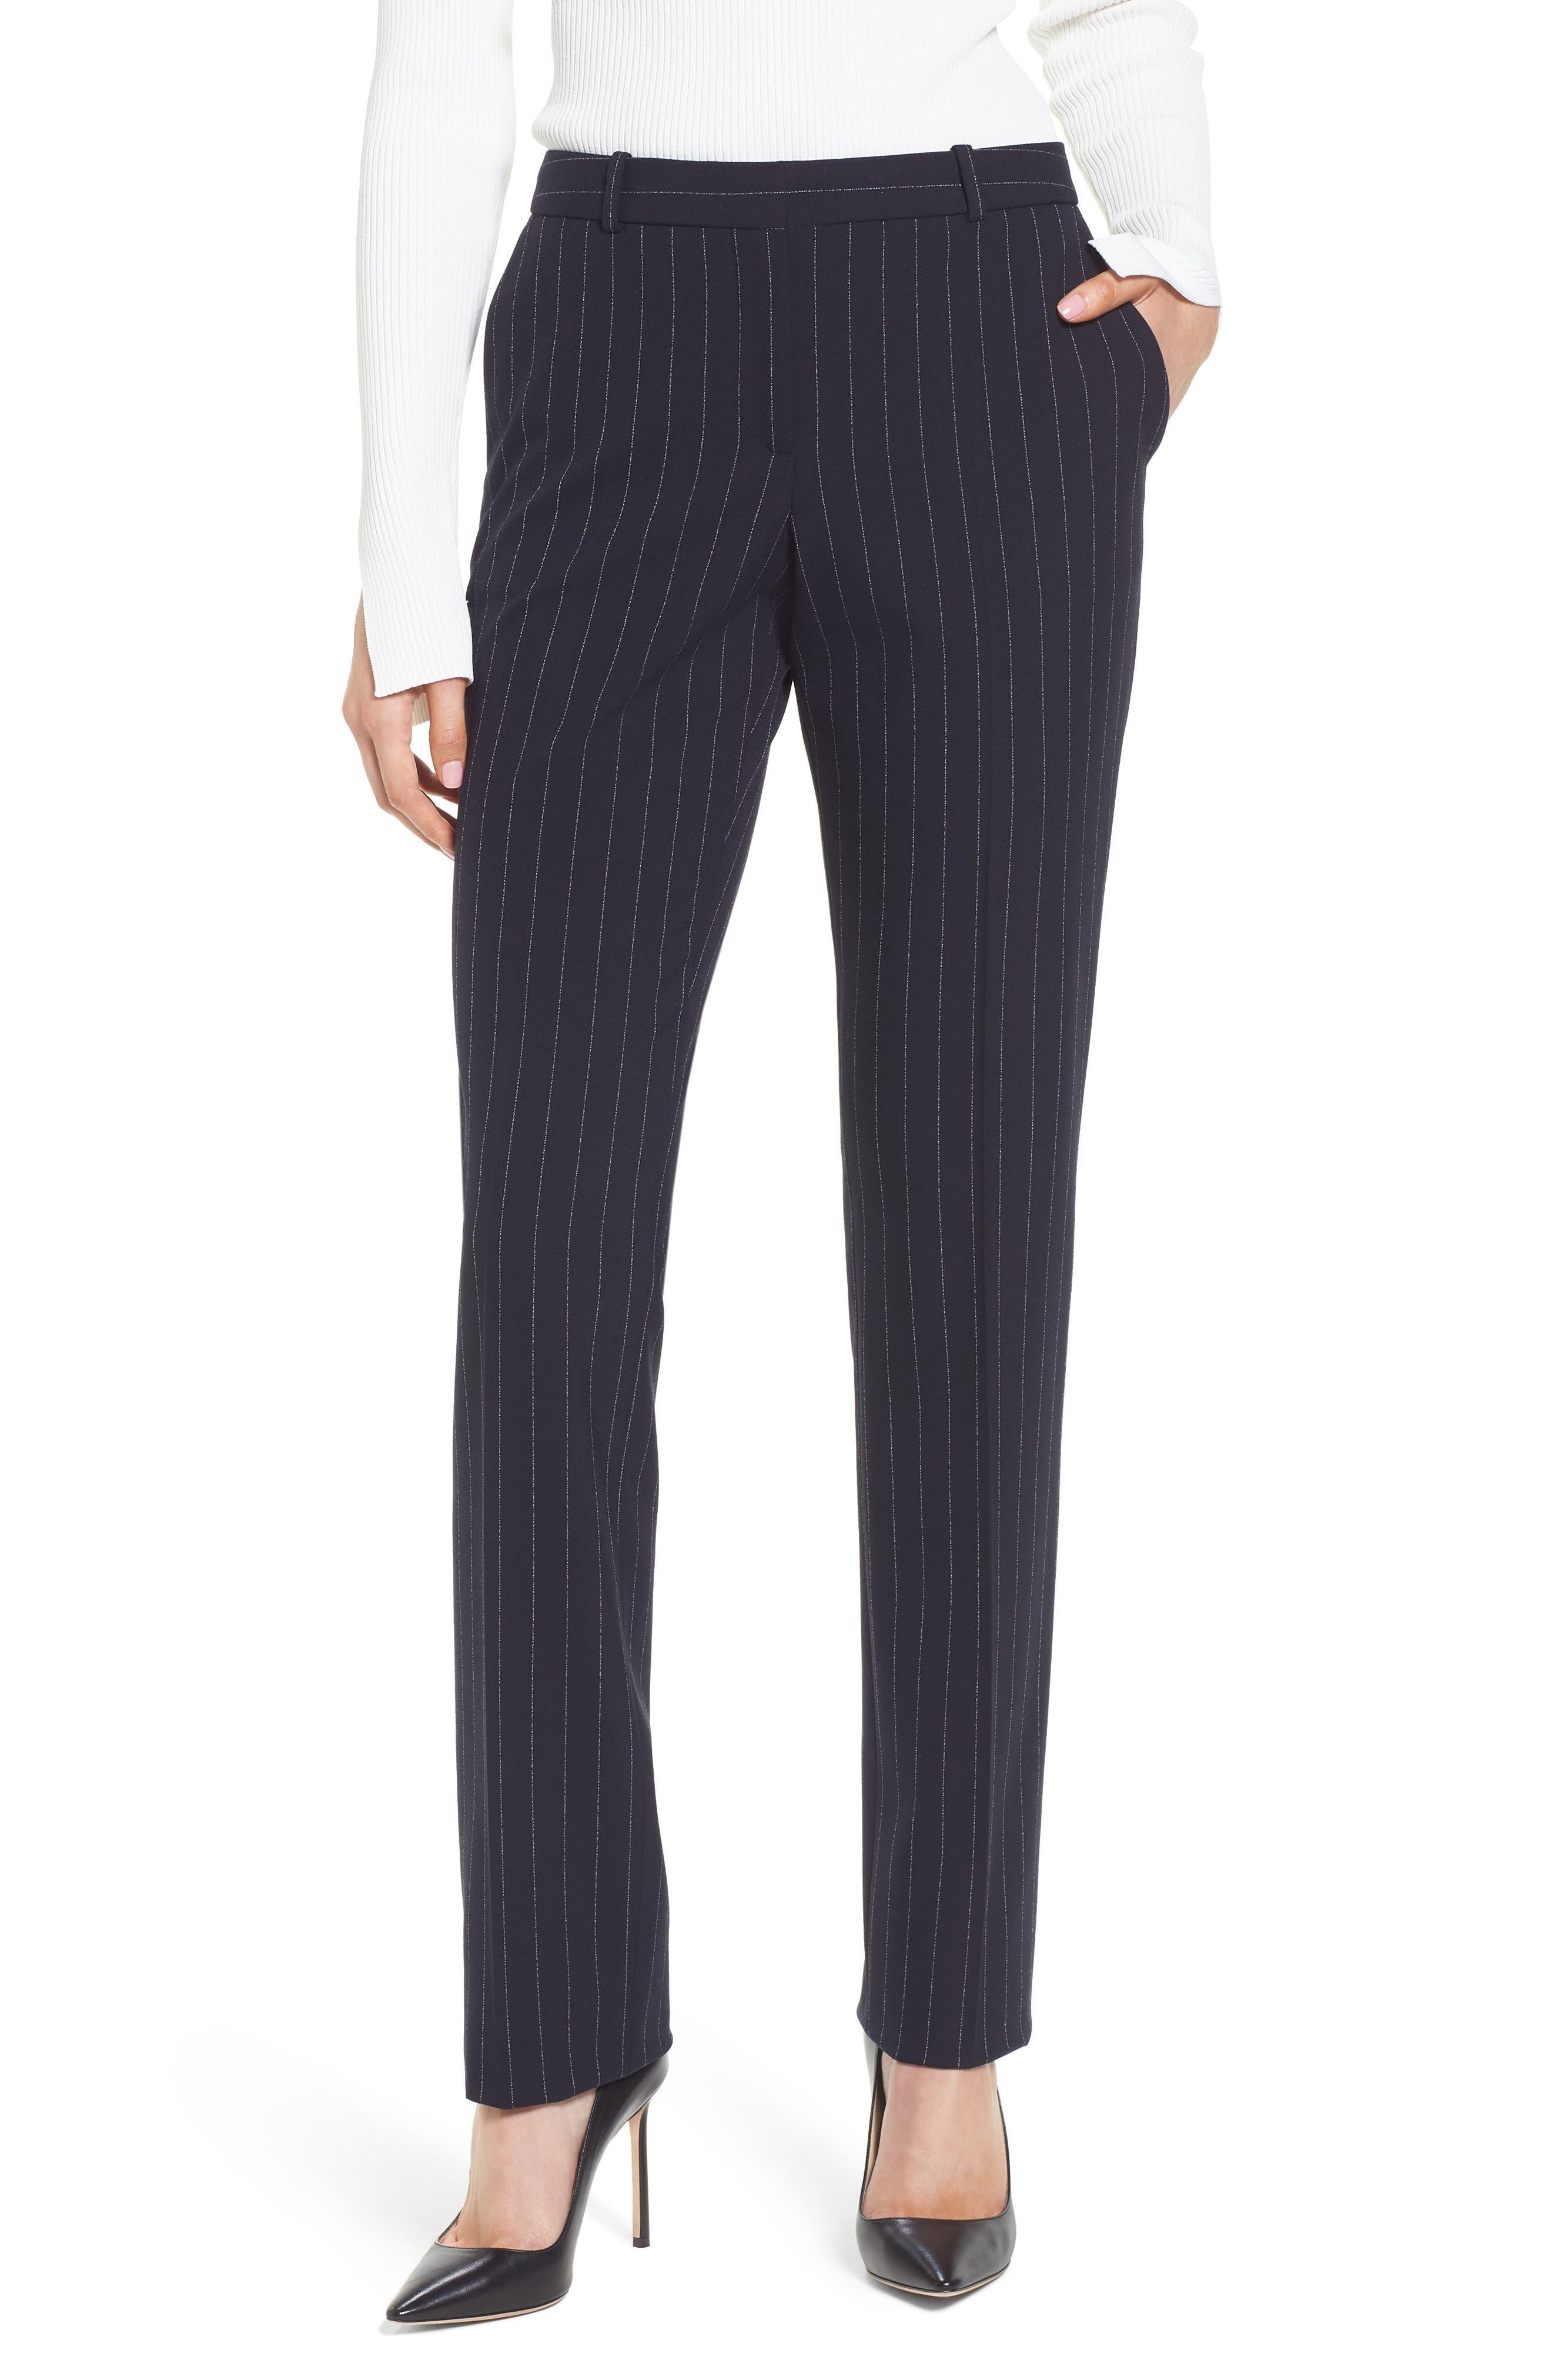 Titana Pinstripe Suit Trousers,                         Main,                         color, 461